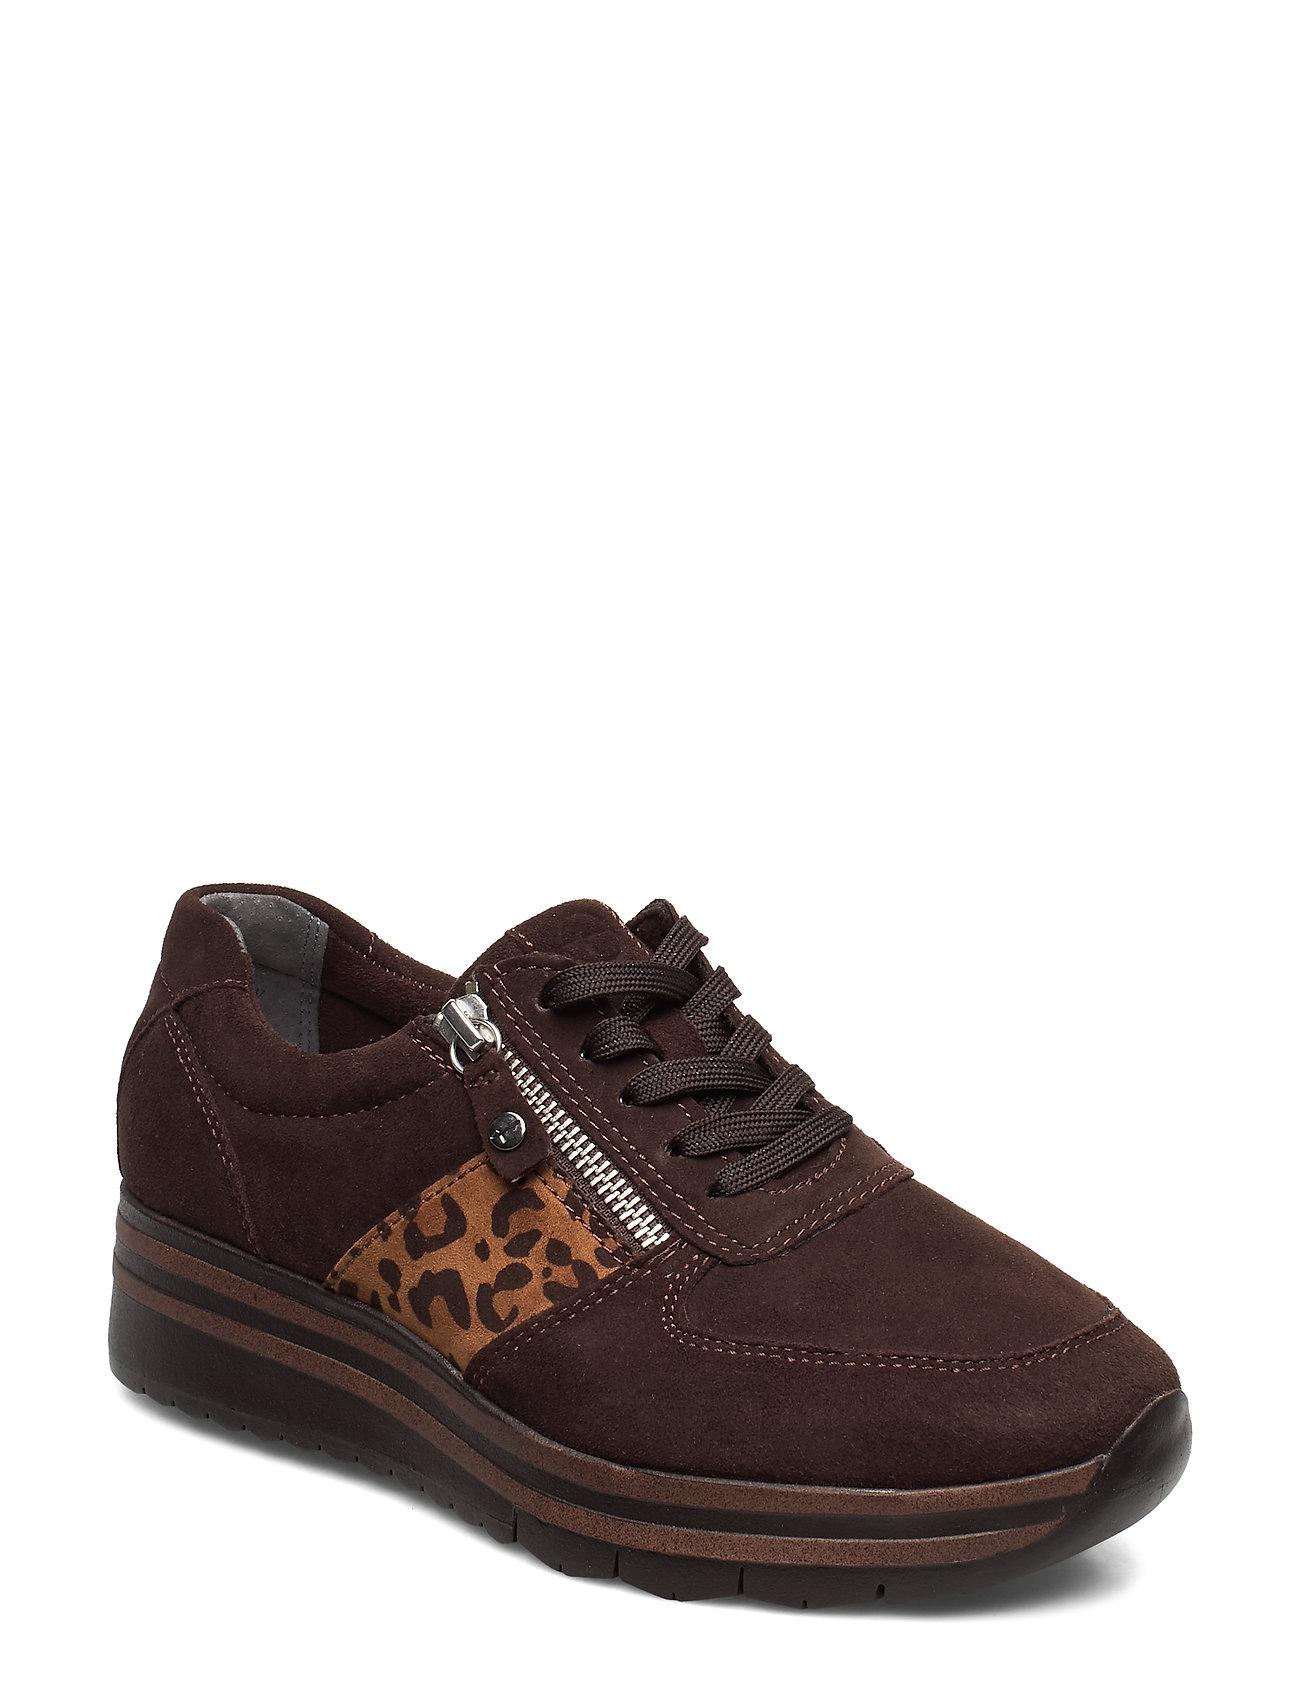 Image of Woms Lace-Up Low-top Sneakers Brun Tamaris (3305107147)